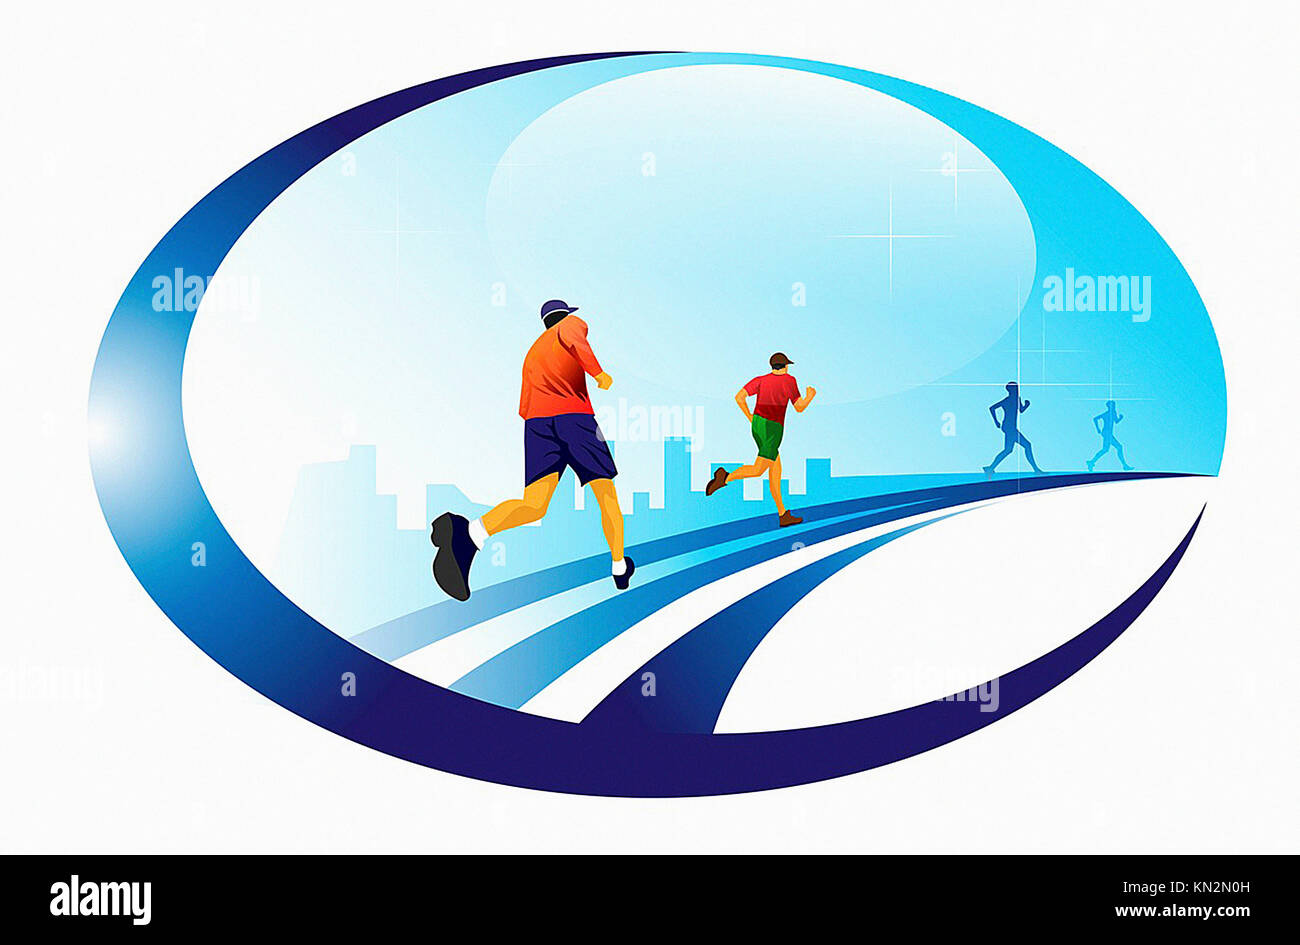 Laufen, 4 männliche Läufer, Vektor-illustration Stockbild